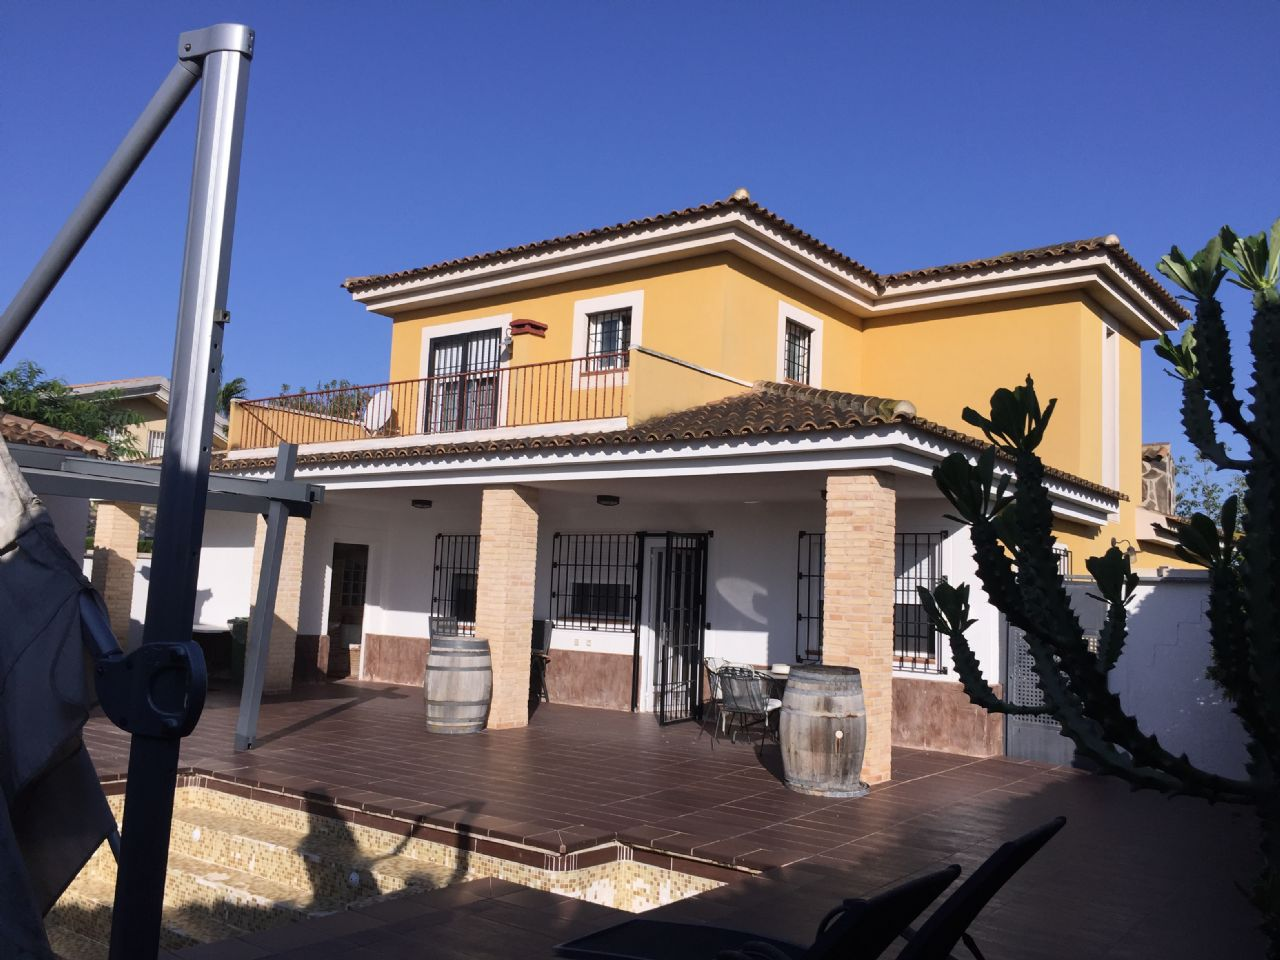 Casa / Chalet en Molina de Segura, EL CHORRICO, venta